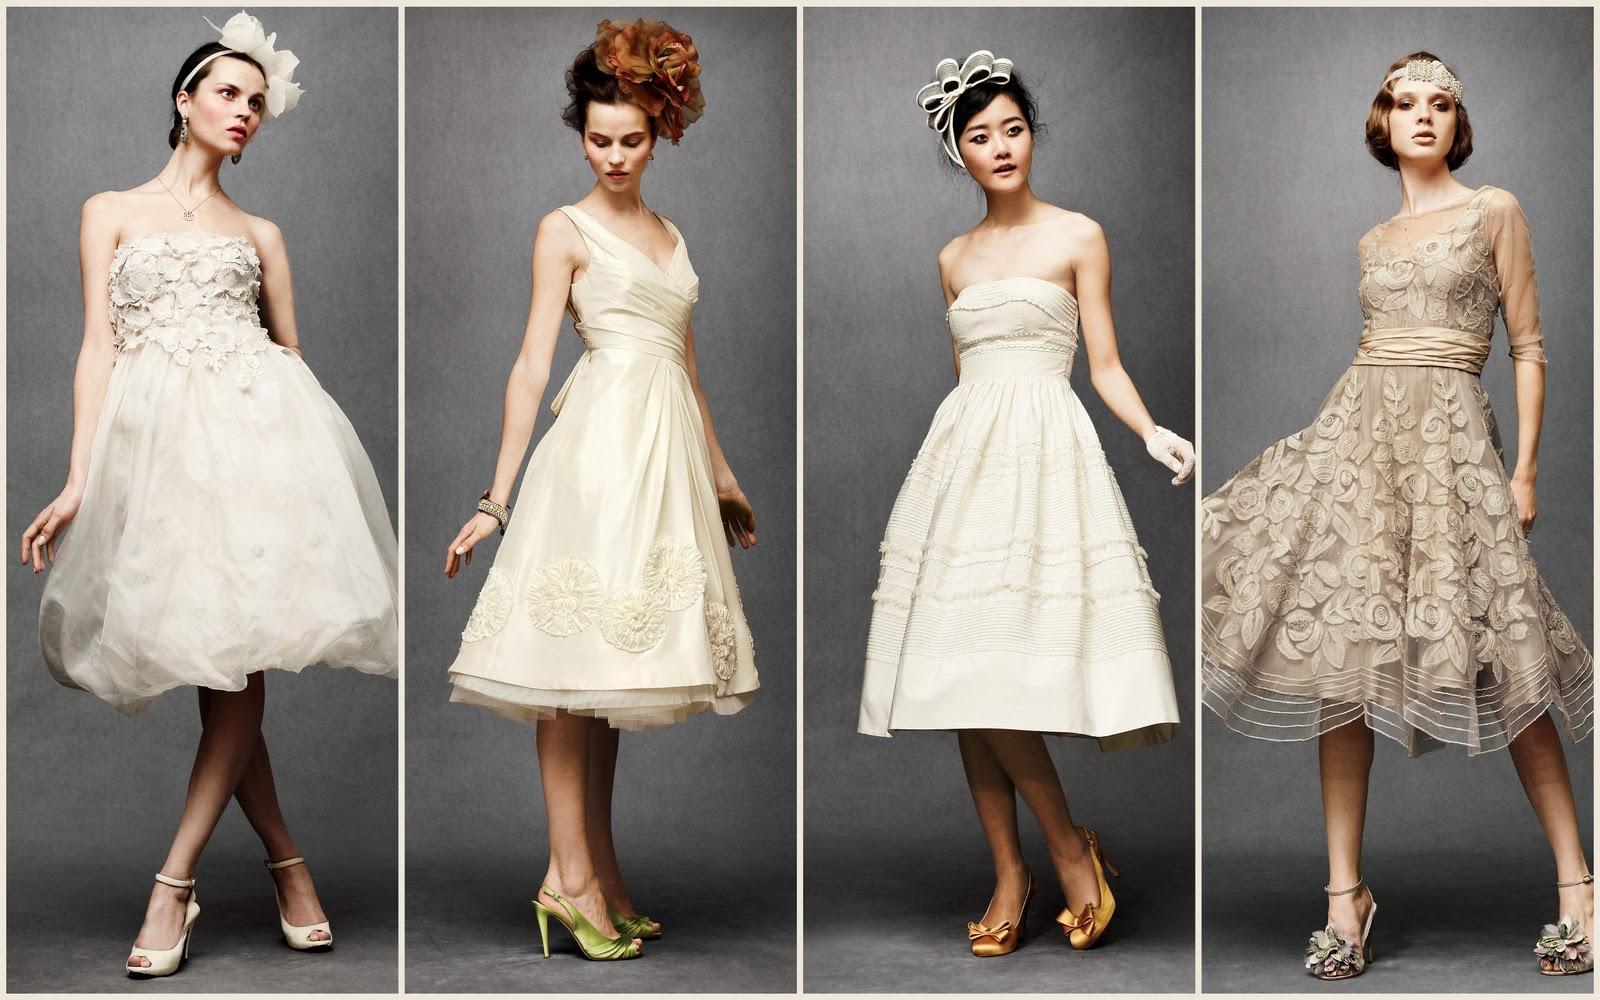 urban wedding dress